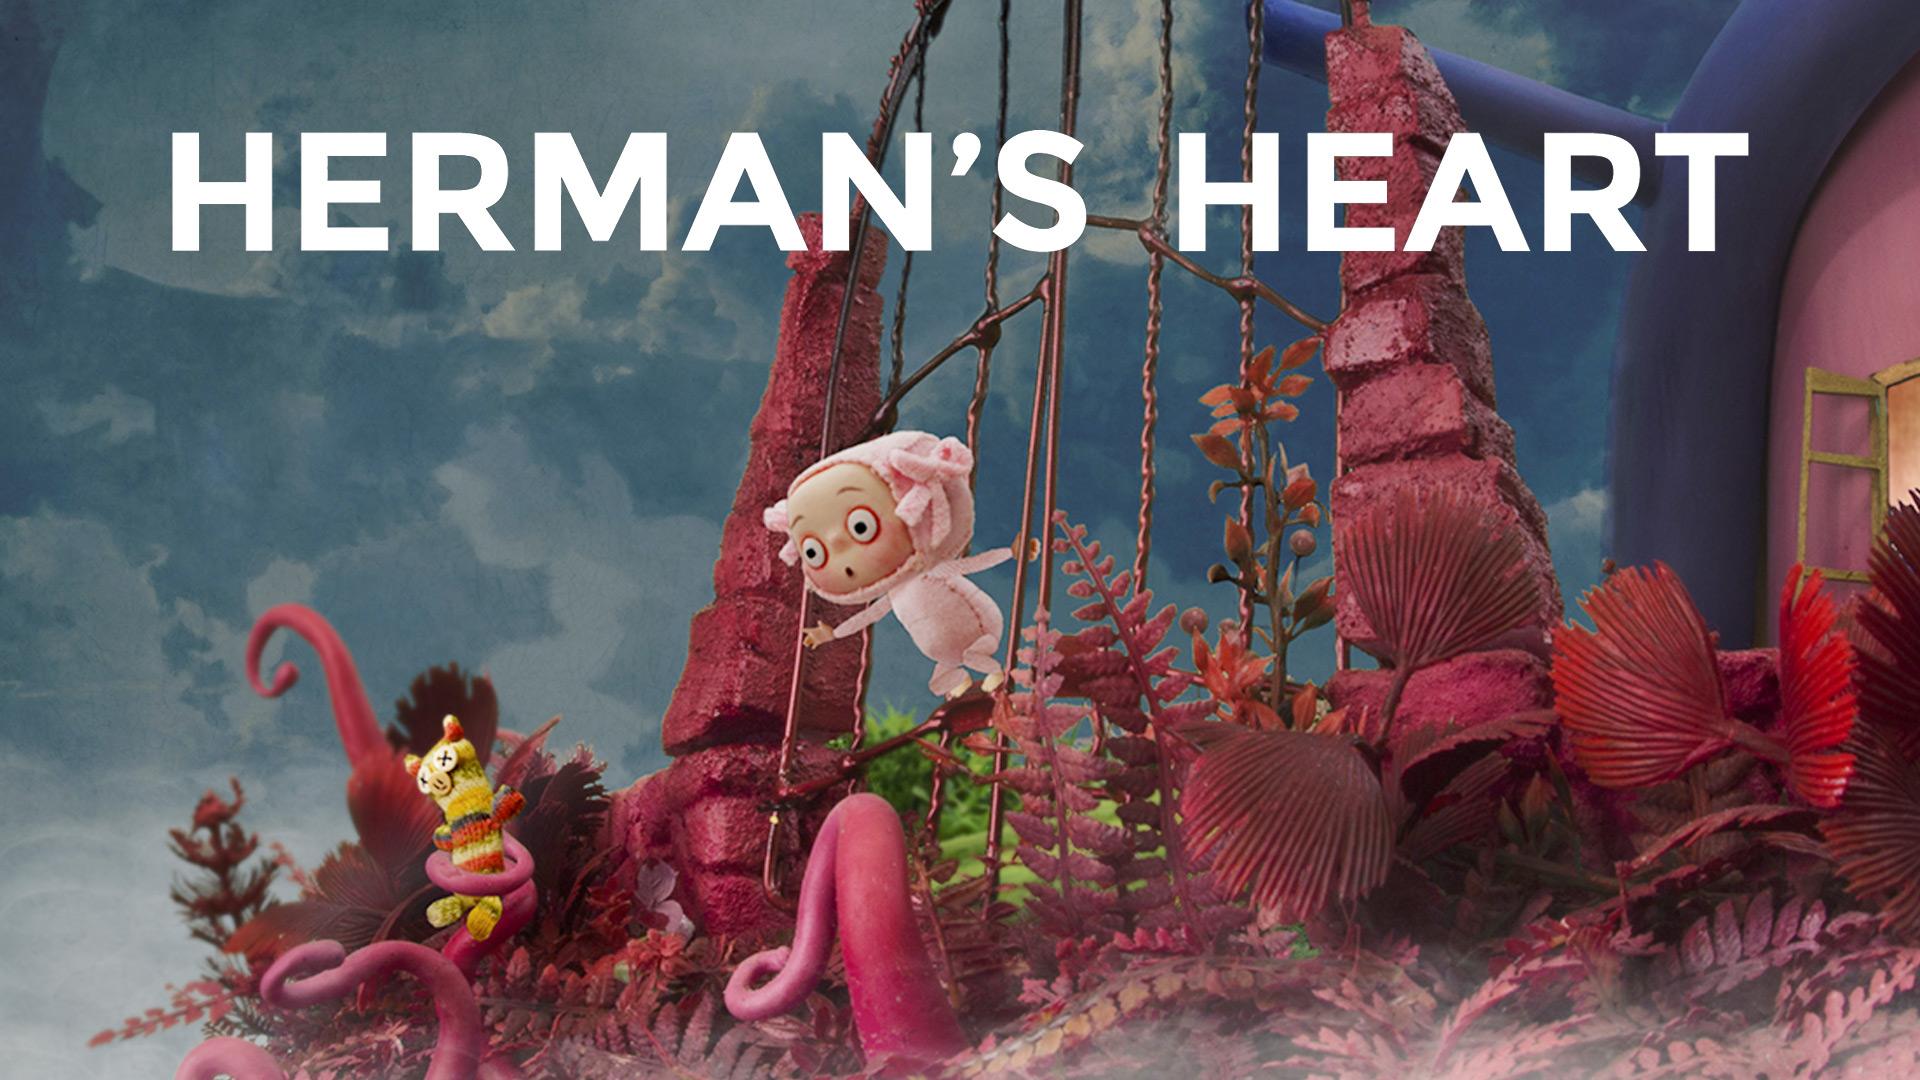 Herman's Heart